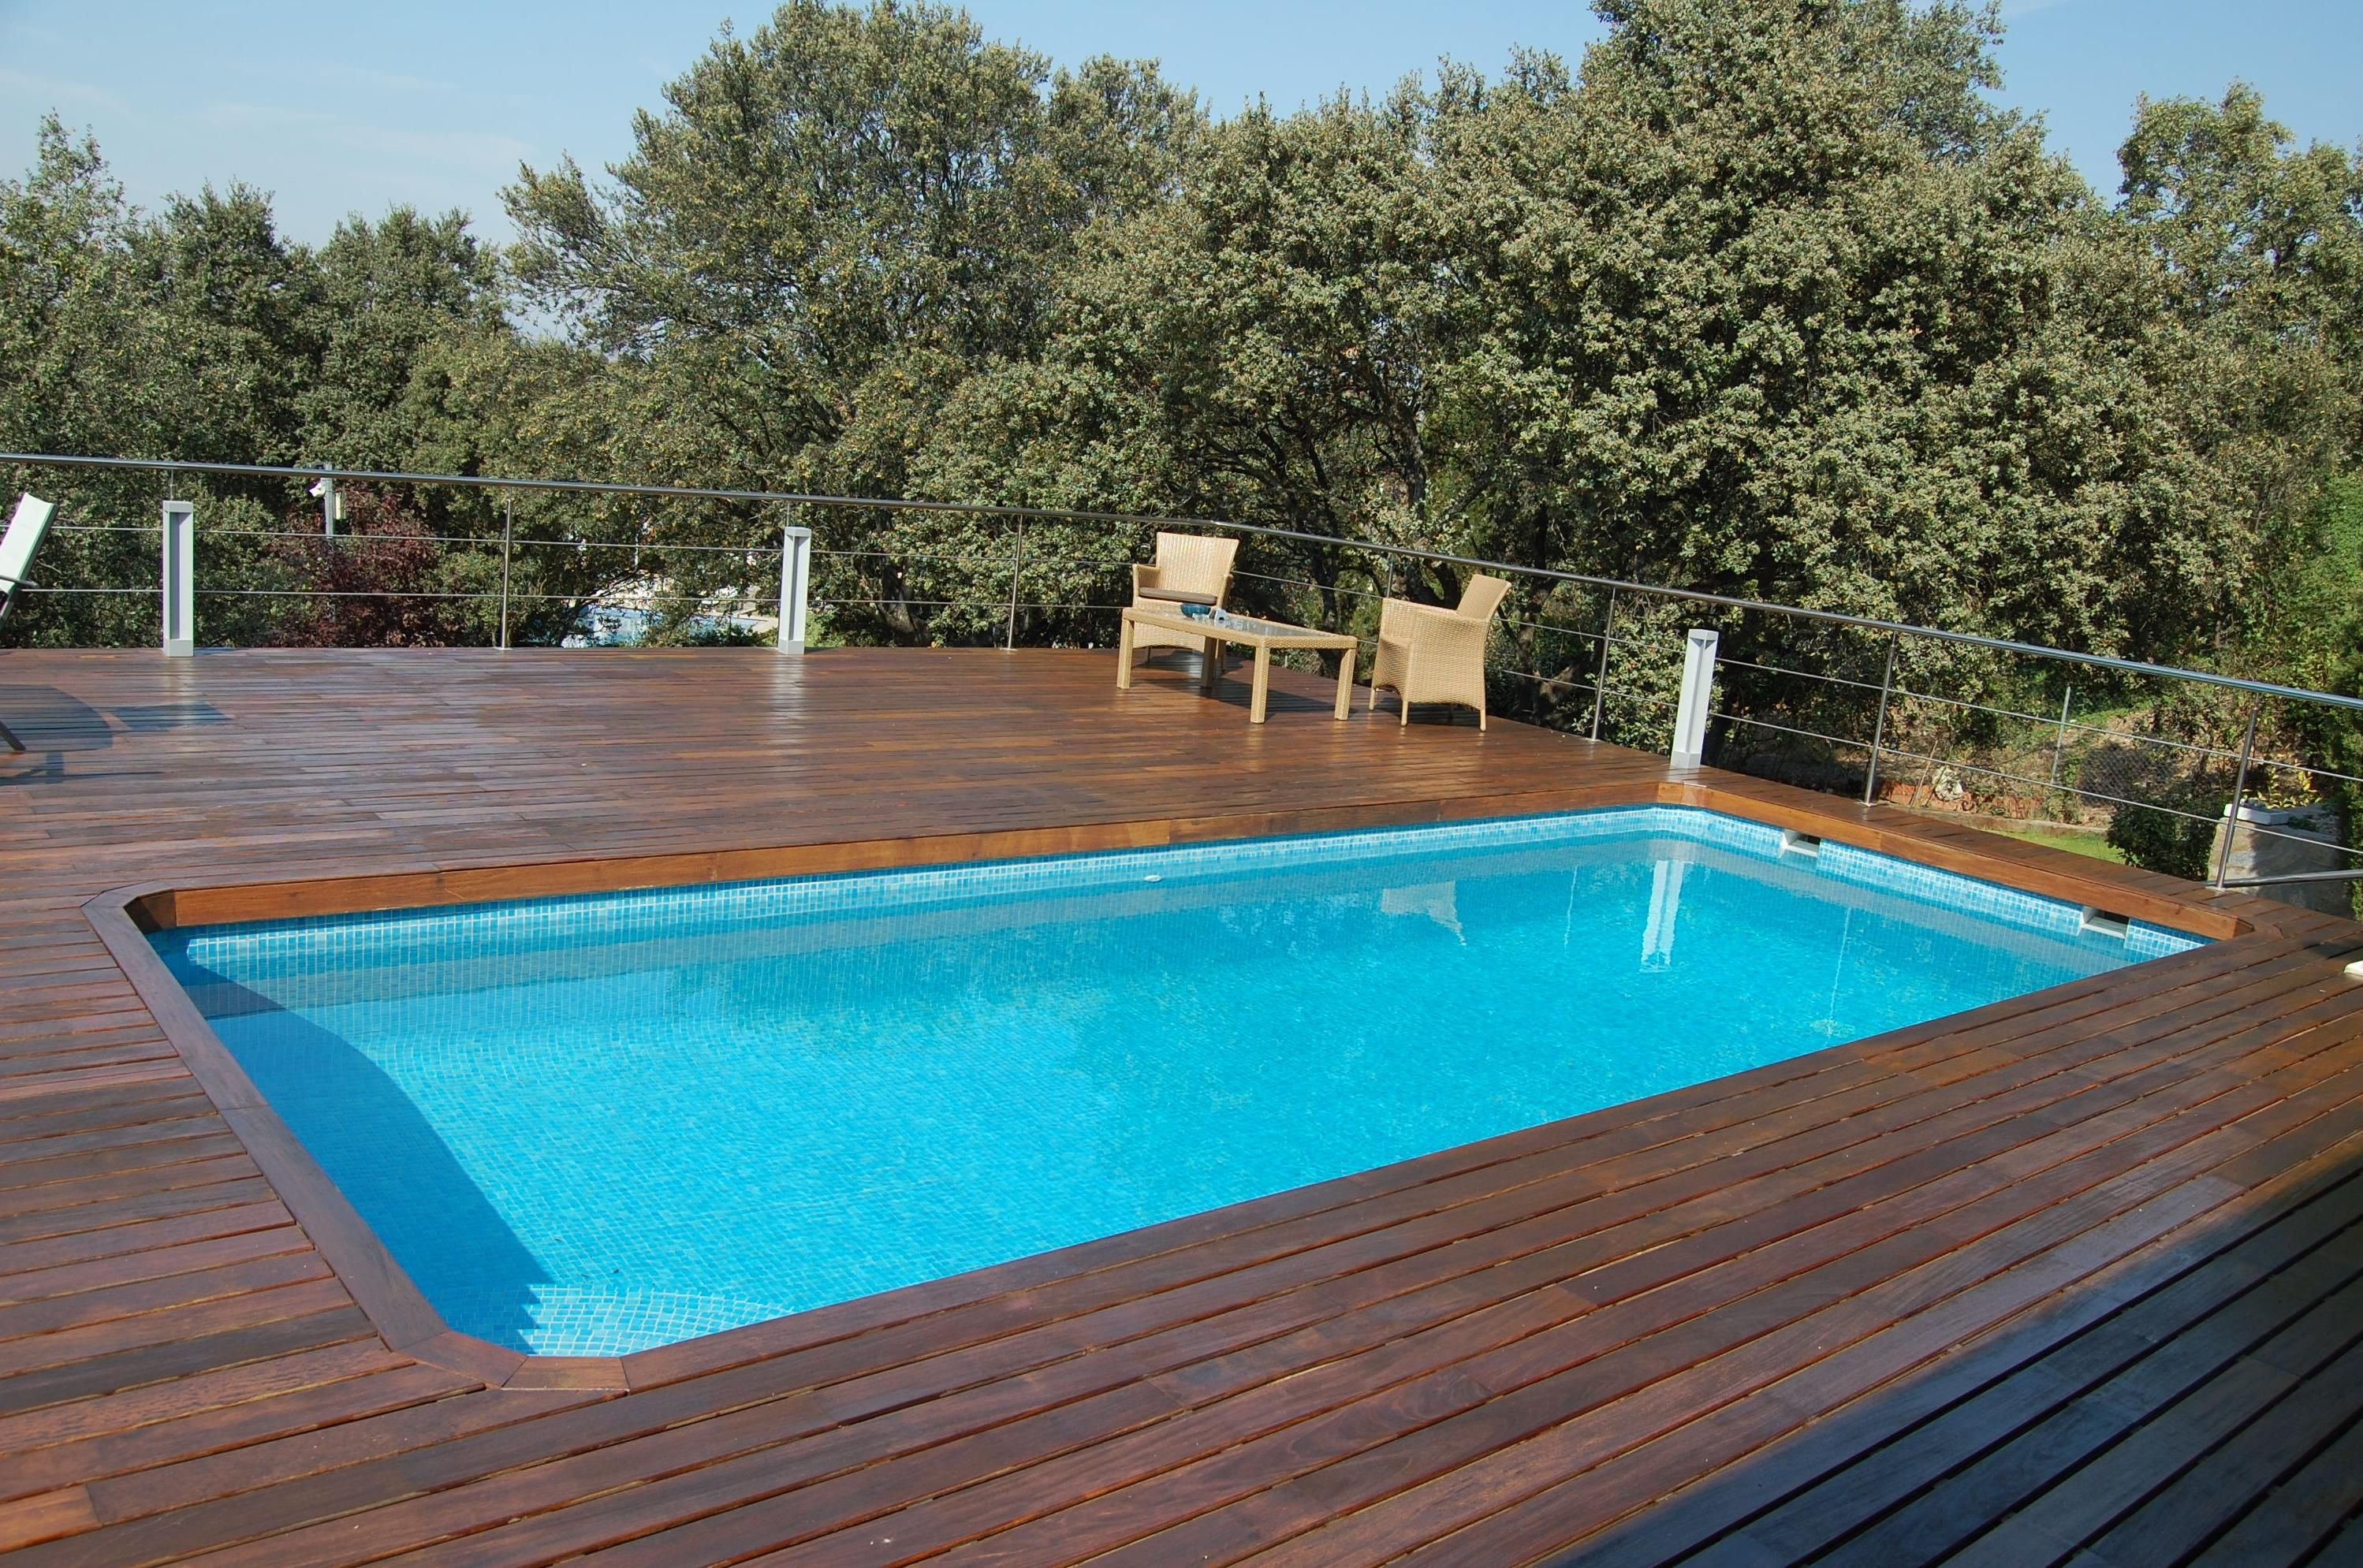 Piscina gresite blanco como construir una piscina for Estructuras para piscinas